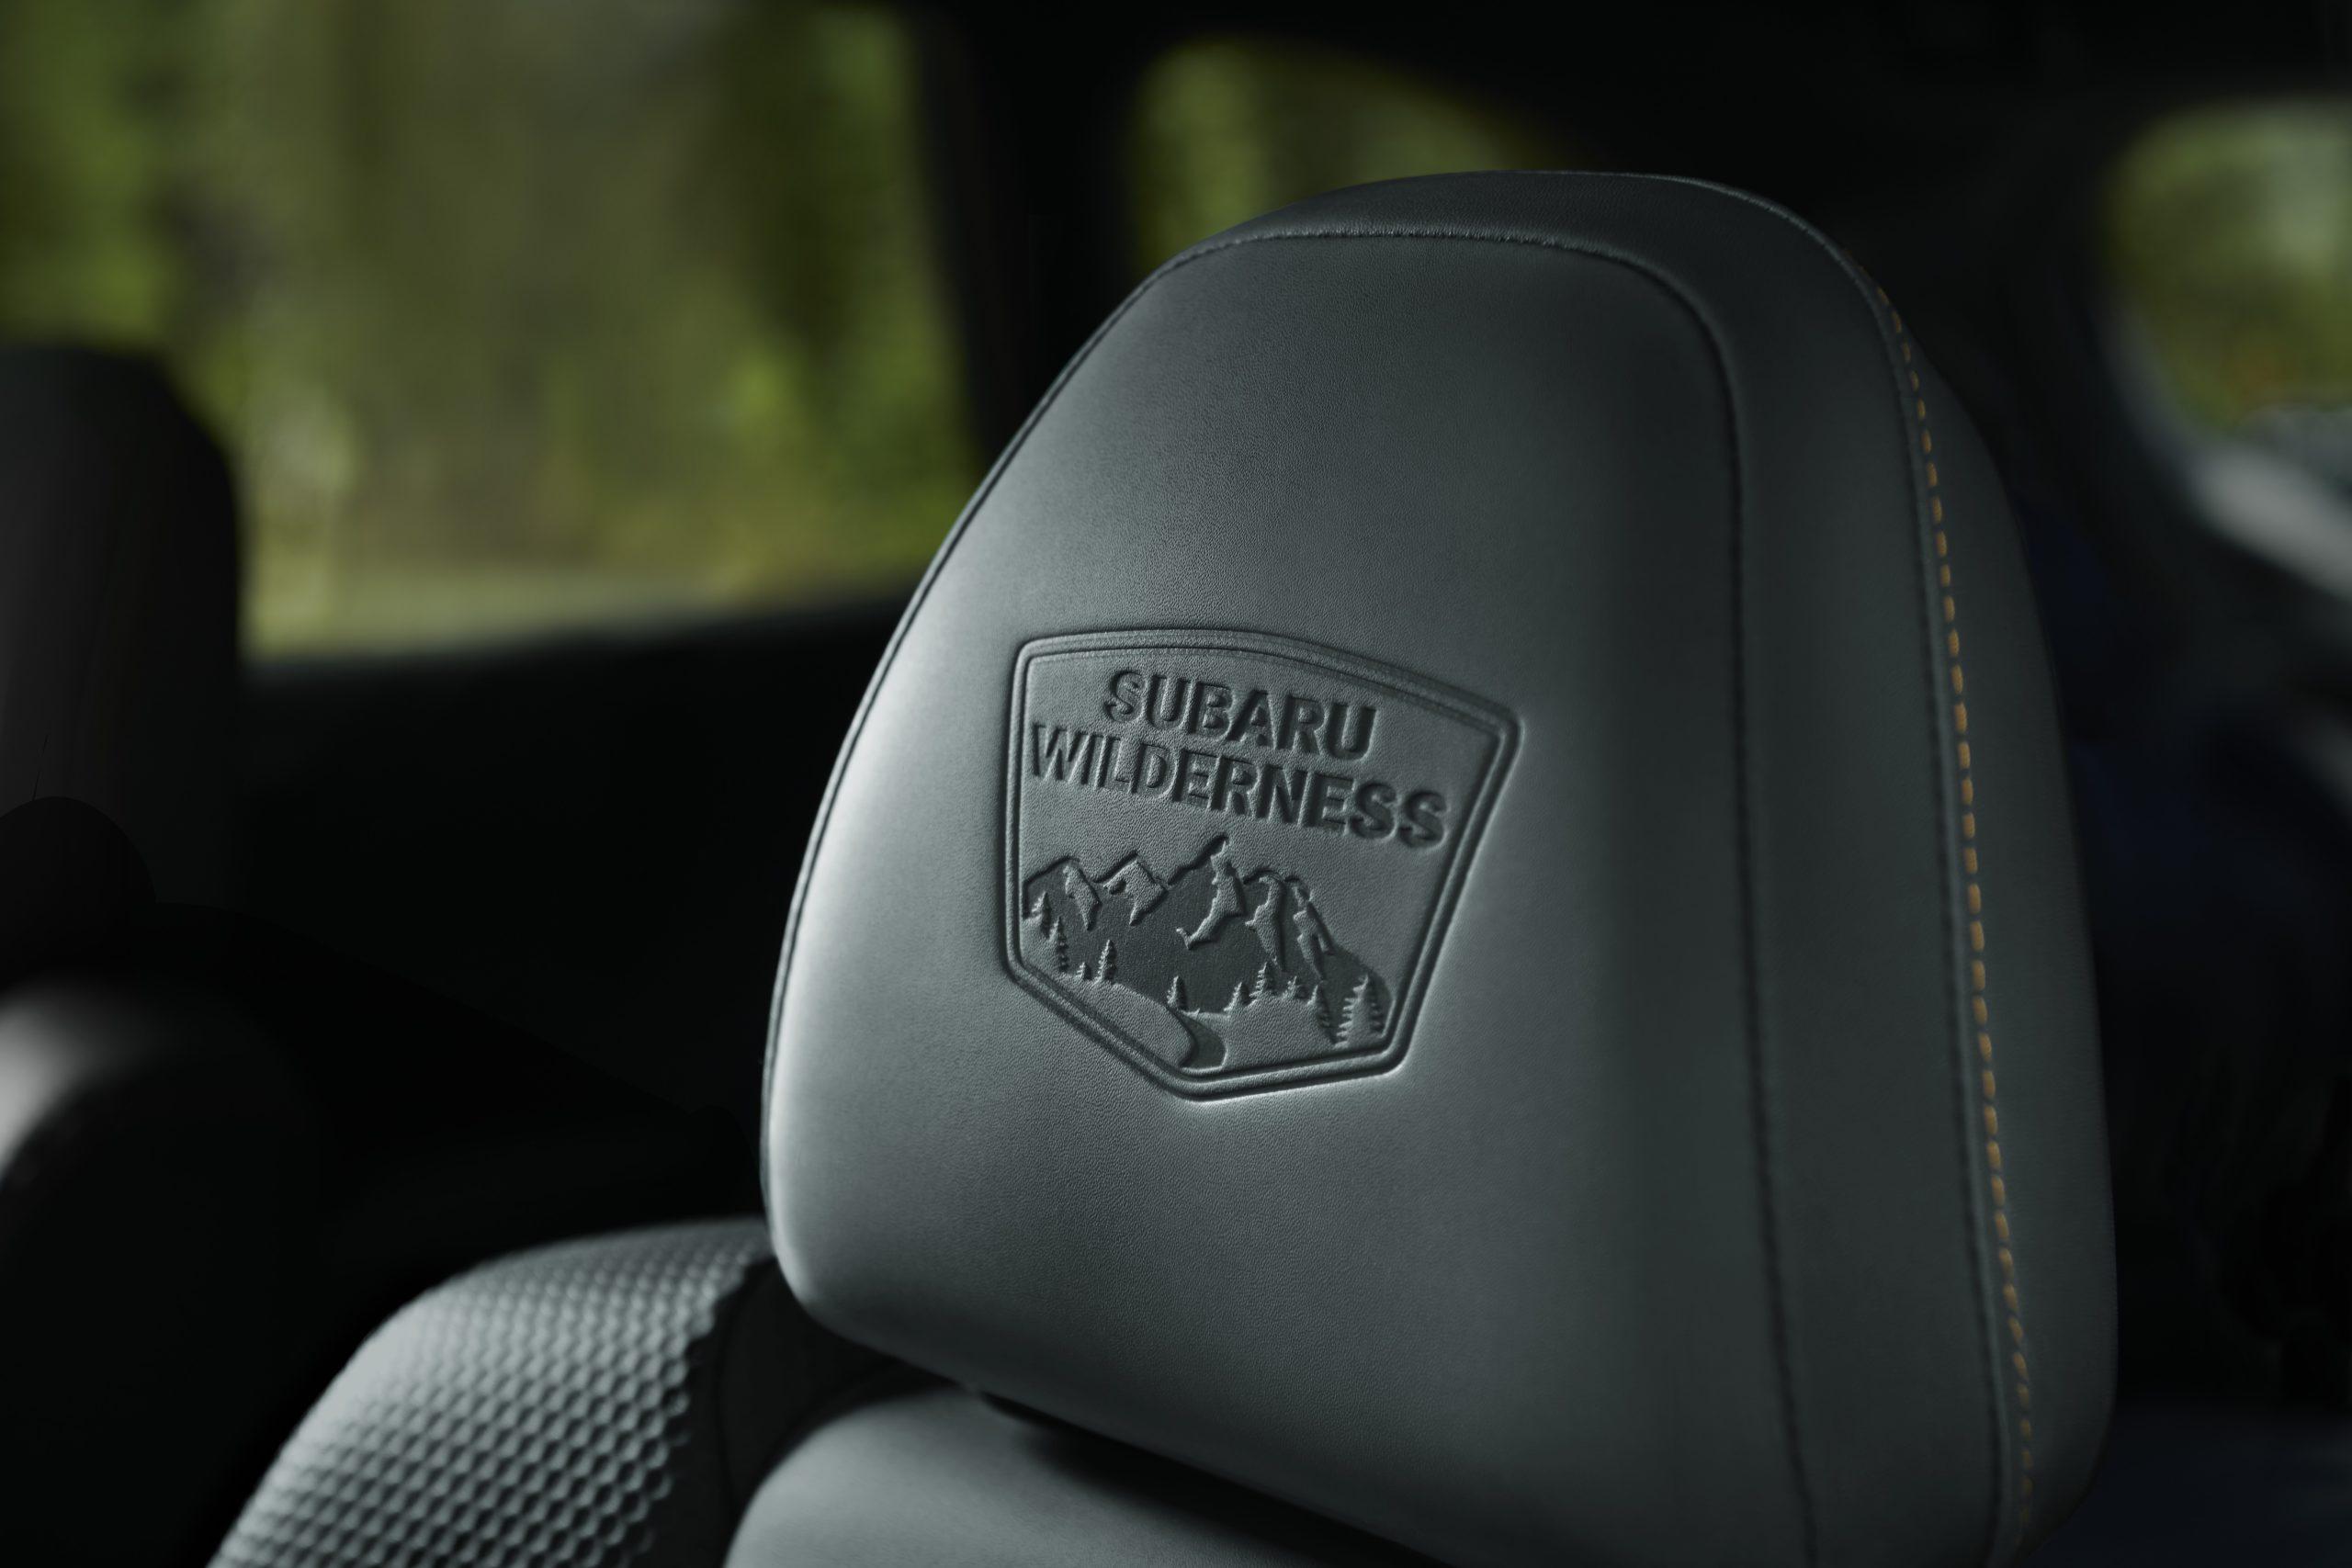 Subaru Wilderness embossed headrest